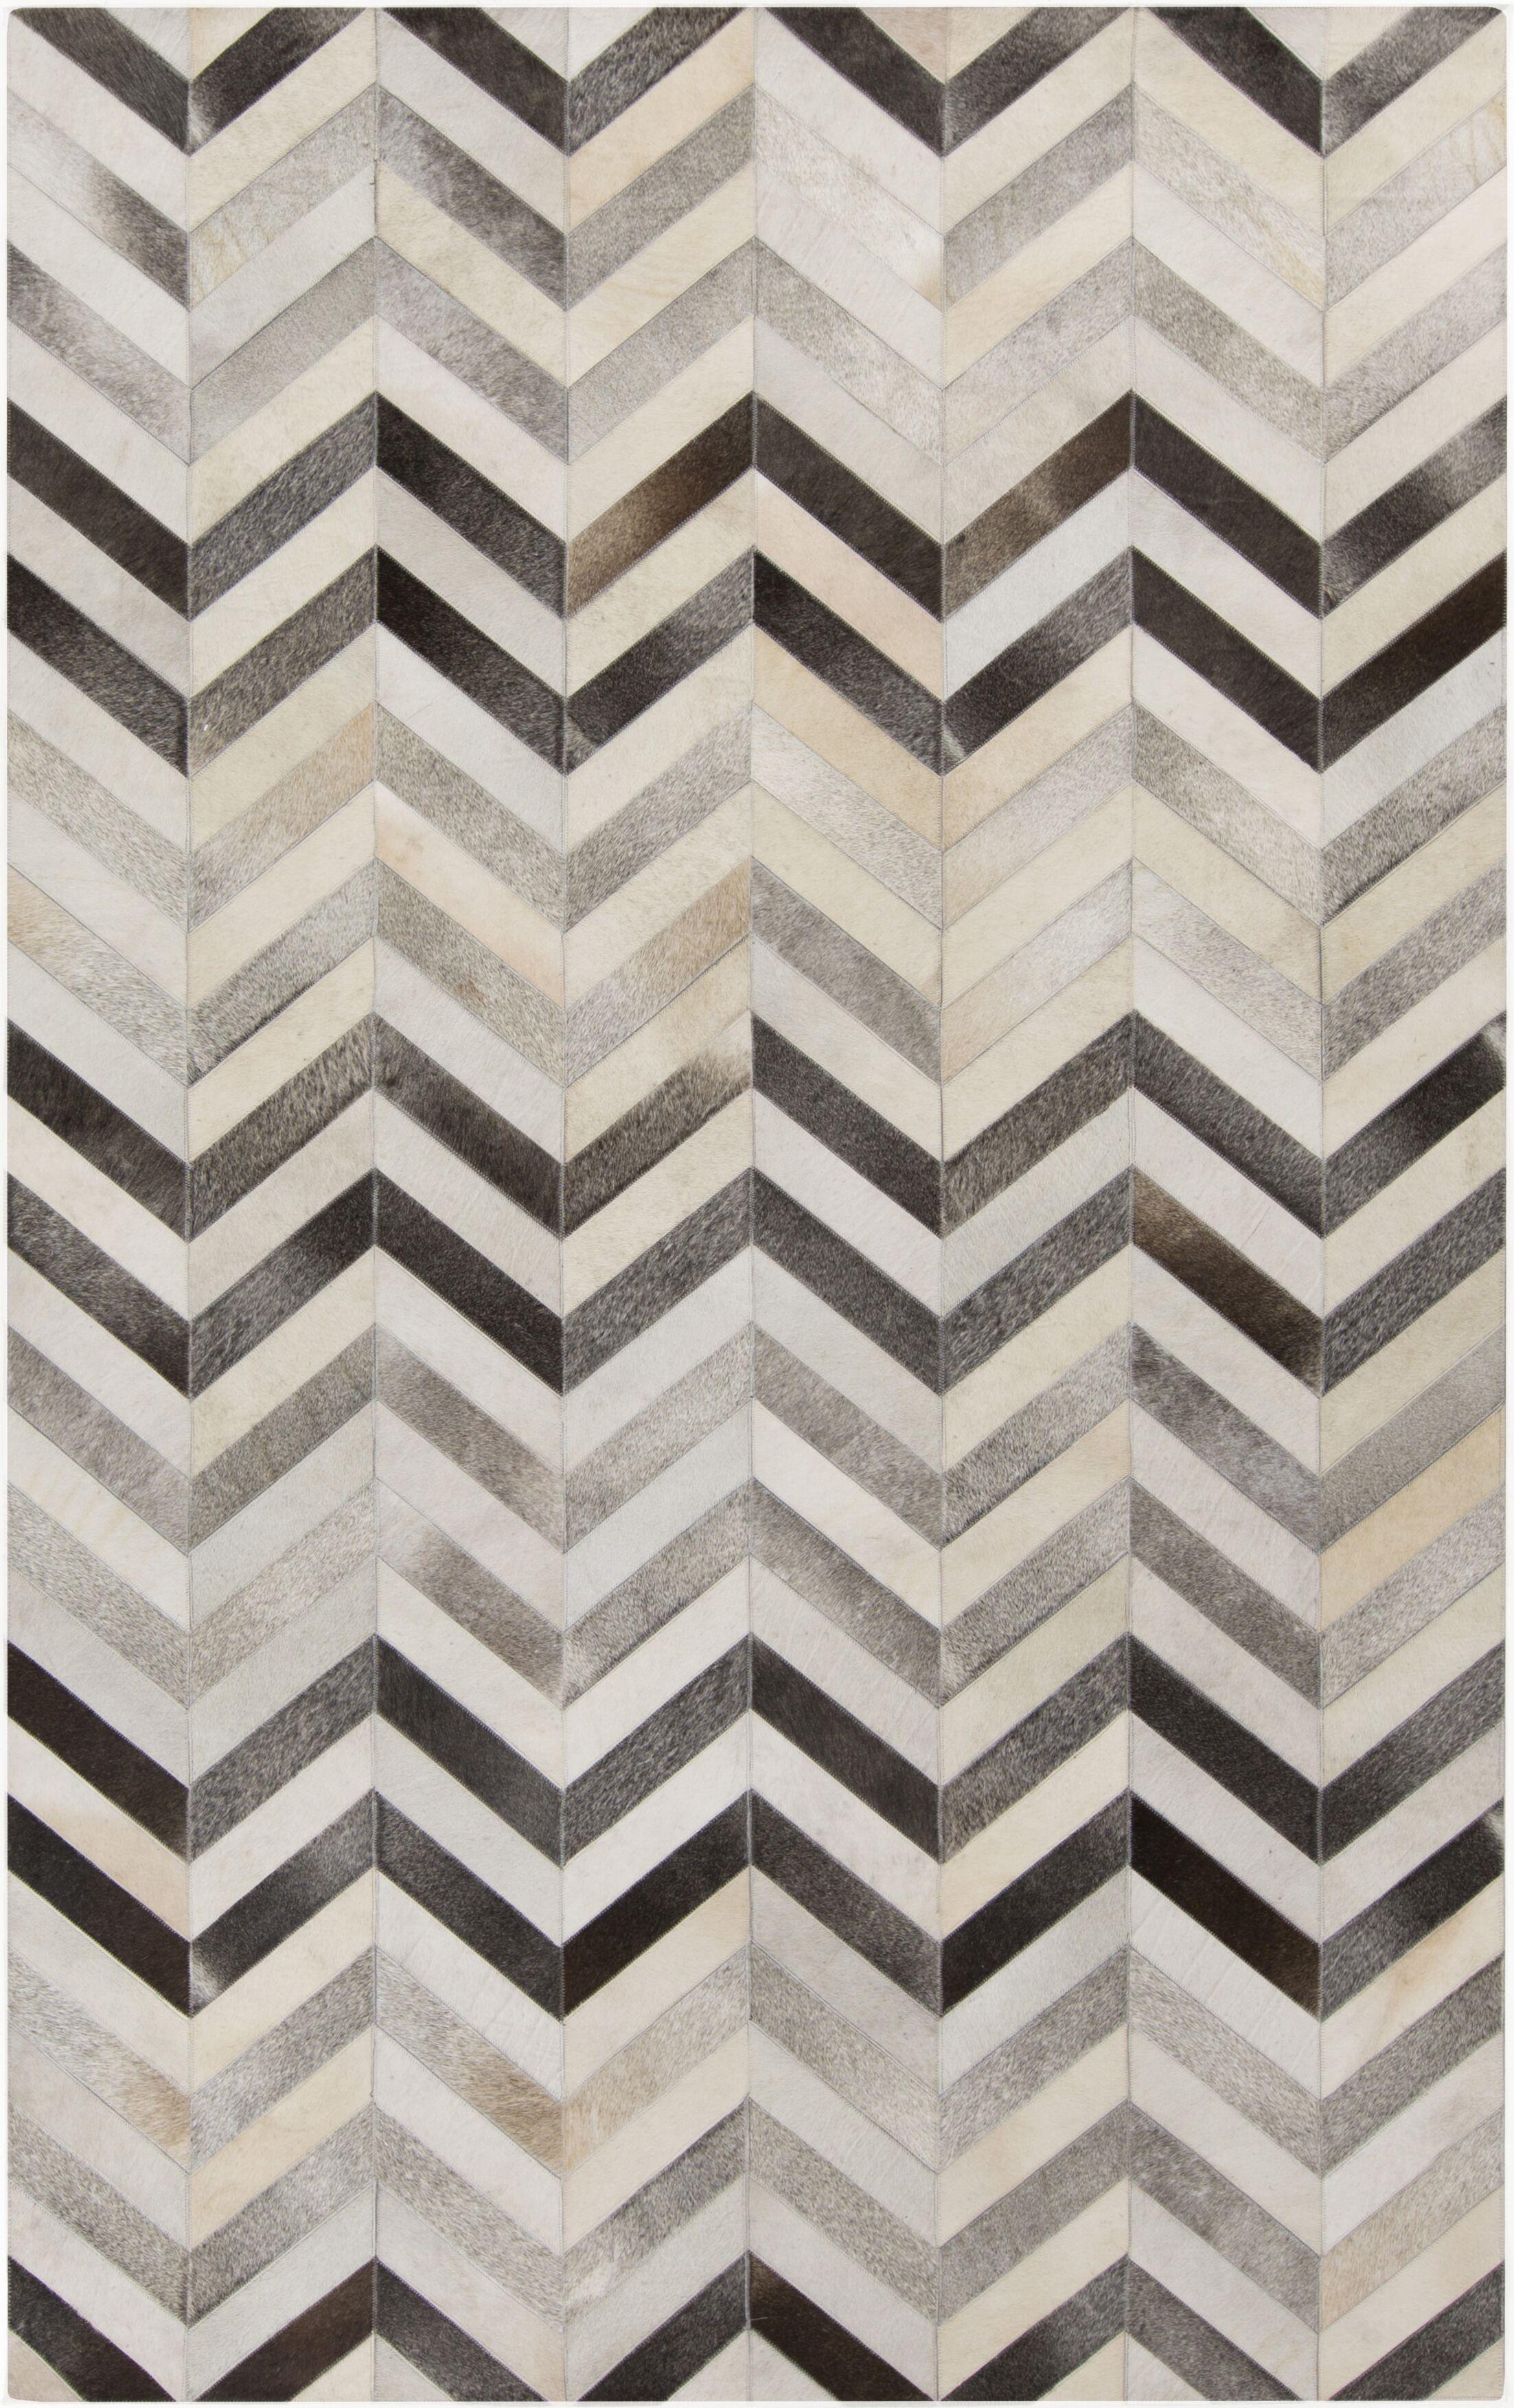 Ortega Light Gray/Charcoal Area Rug Rug Size: Rectangle 2' x 3'